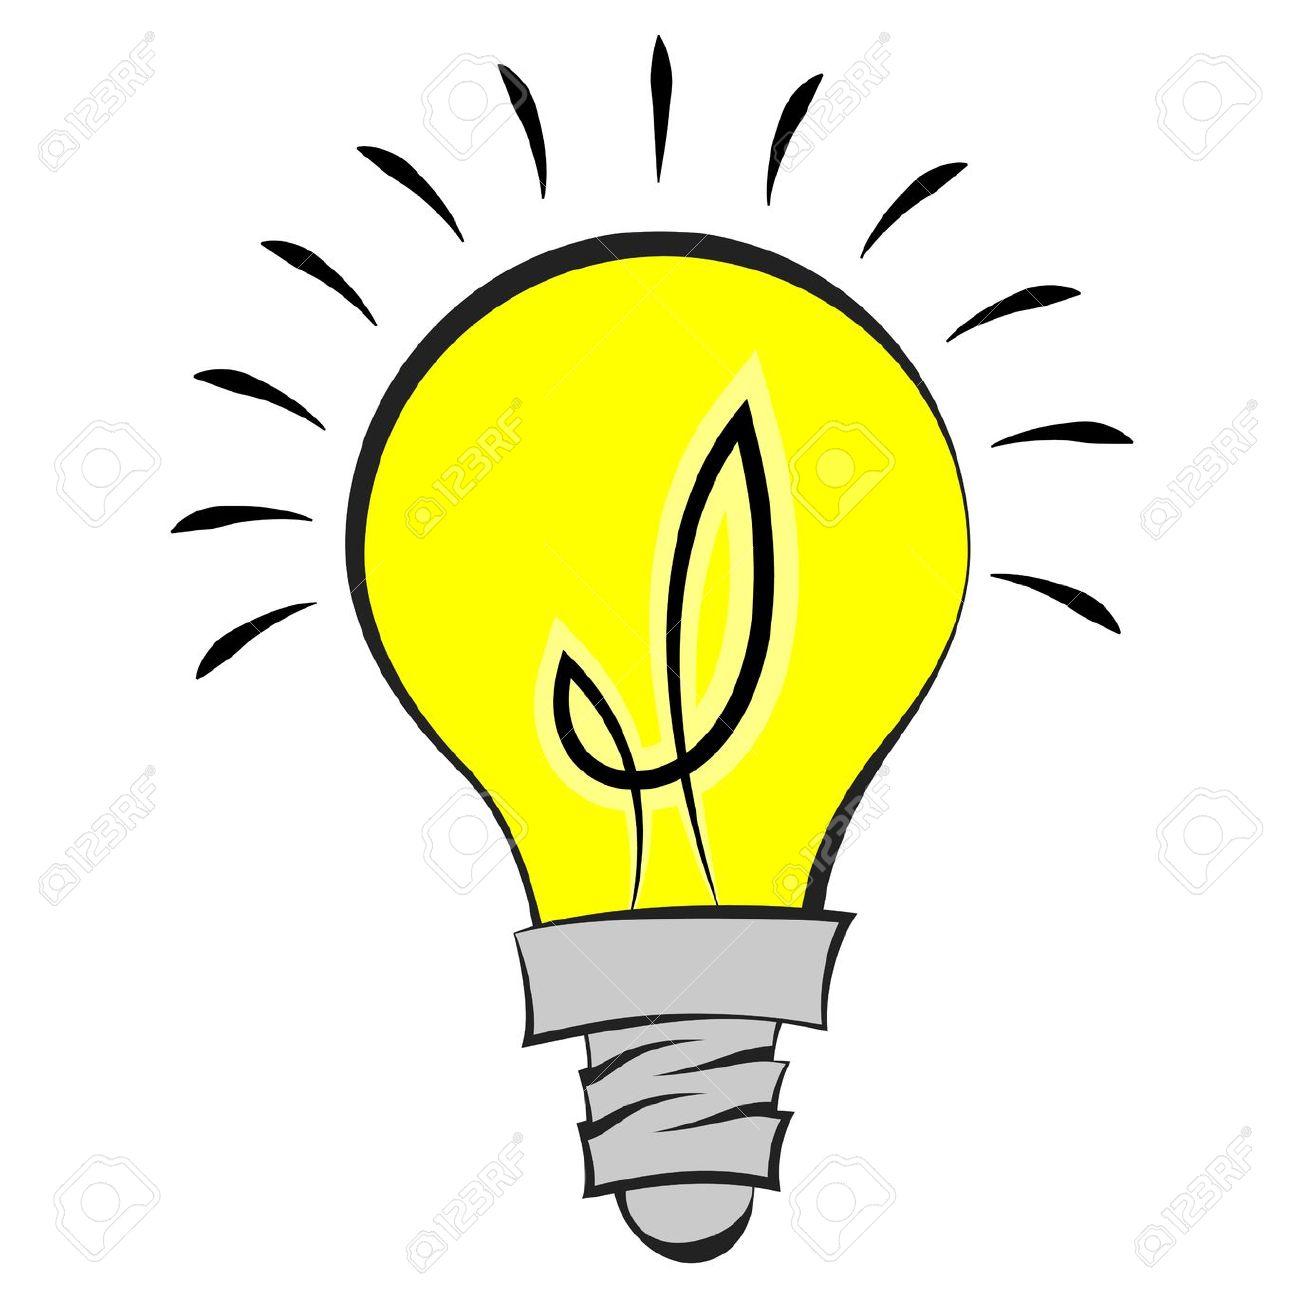 Clipart Light Bulb & Light Bulb Clip Art Images.